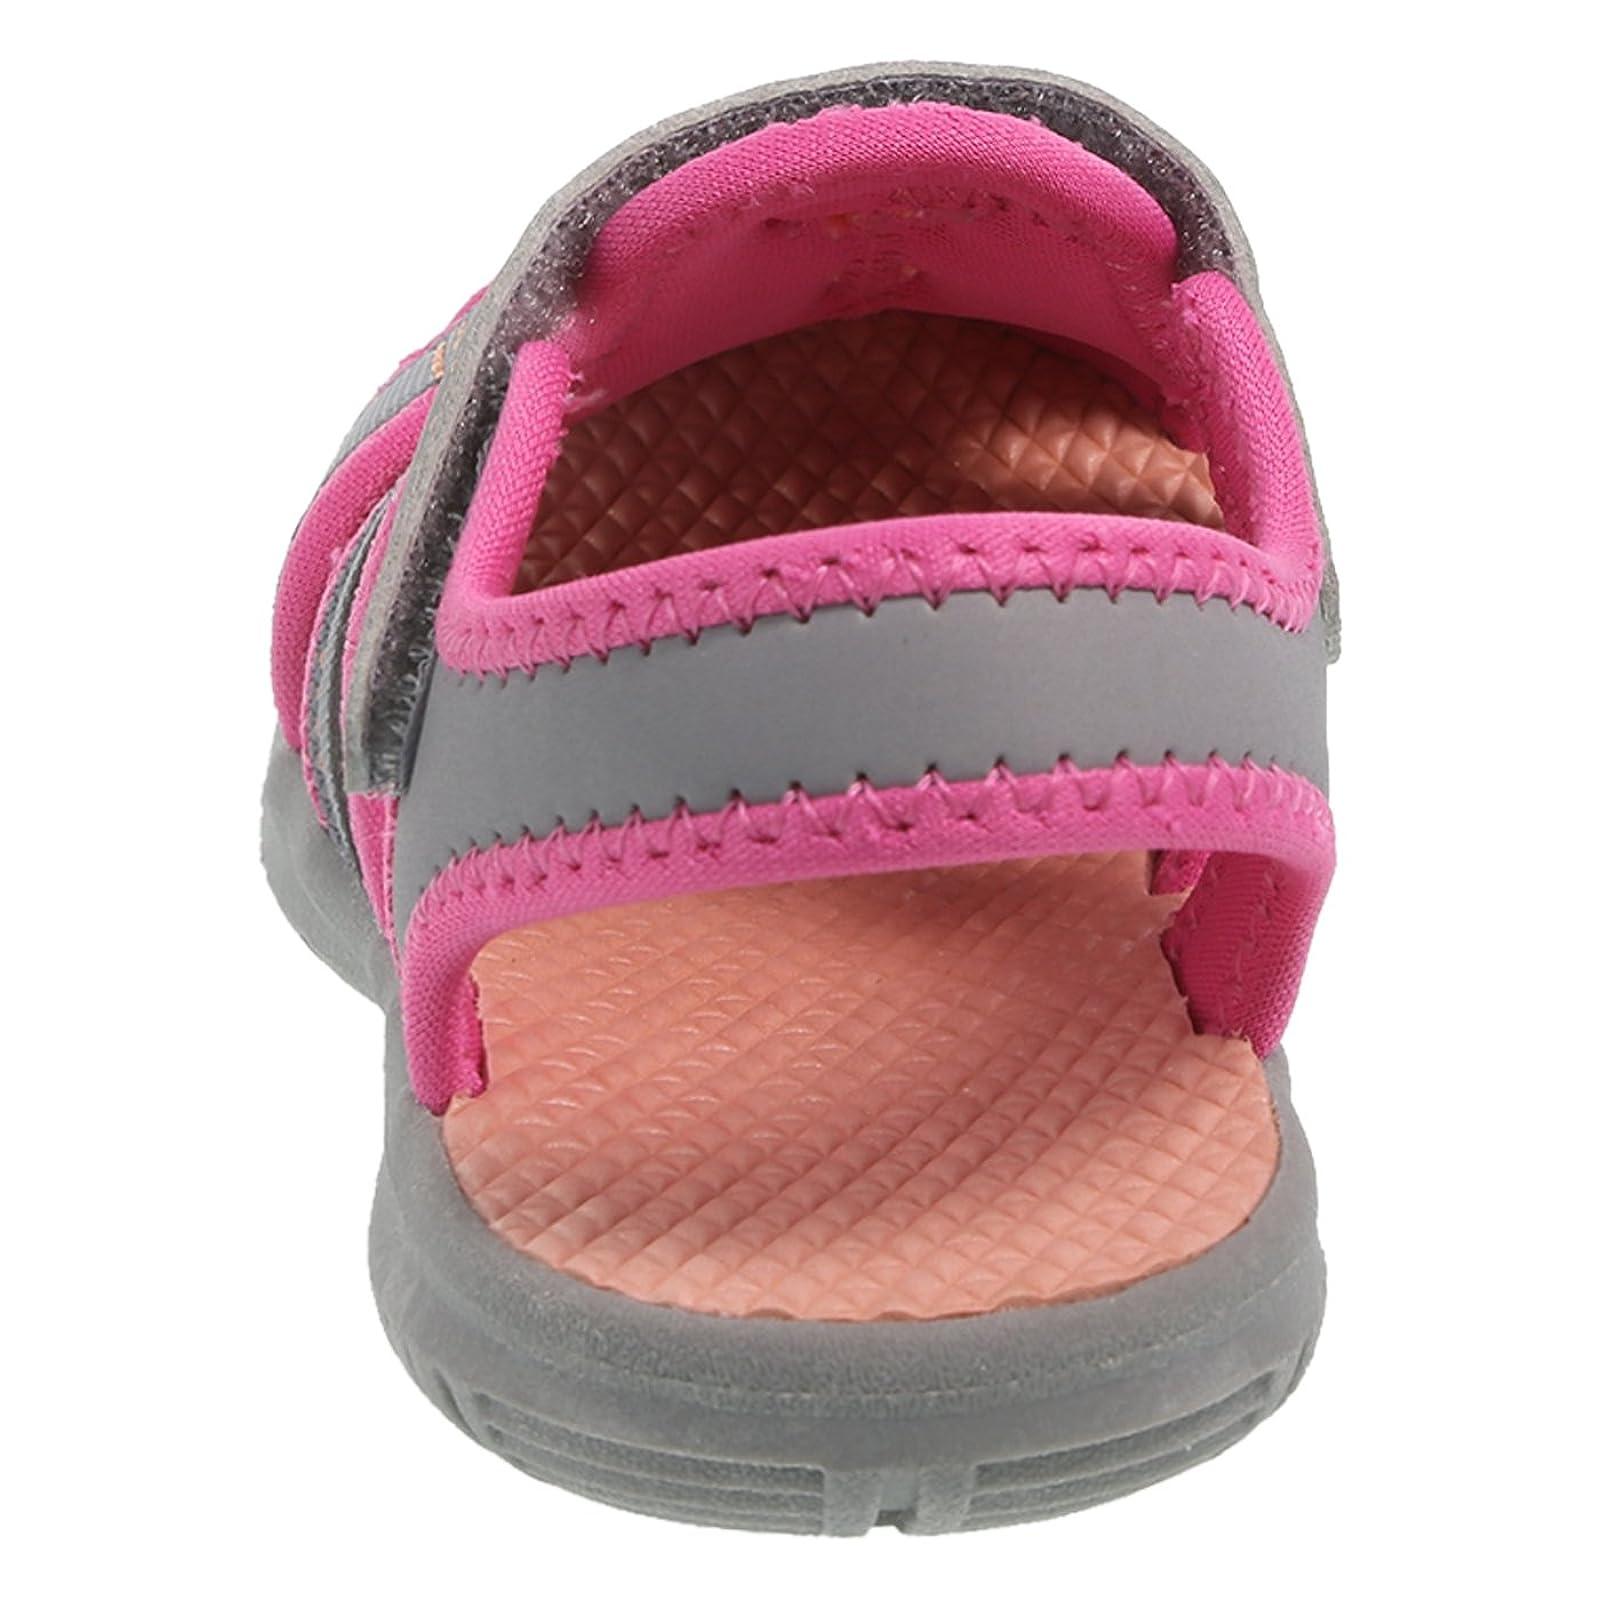 Rugged Outback Girls' Toddler Marina Bumptoe Sandal D(M) Mens - 2